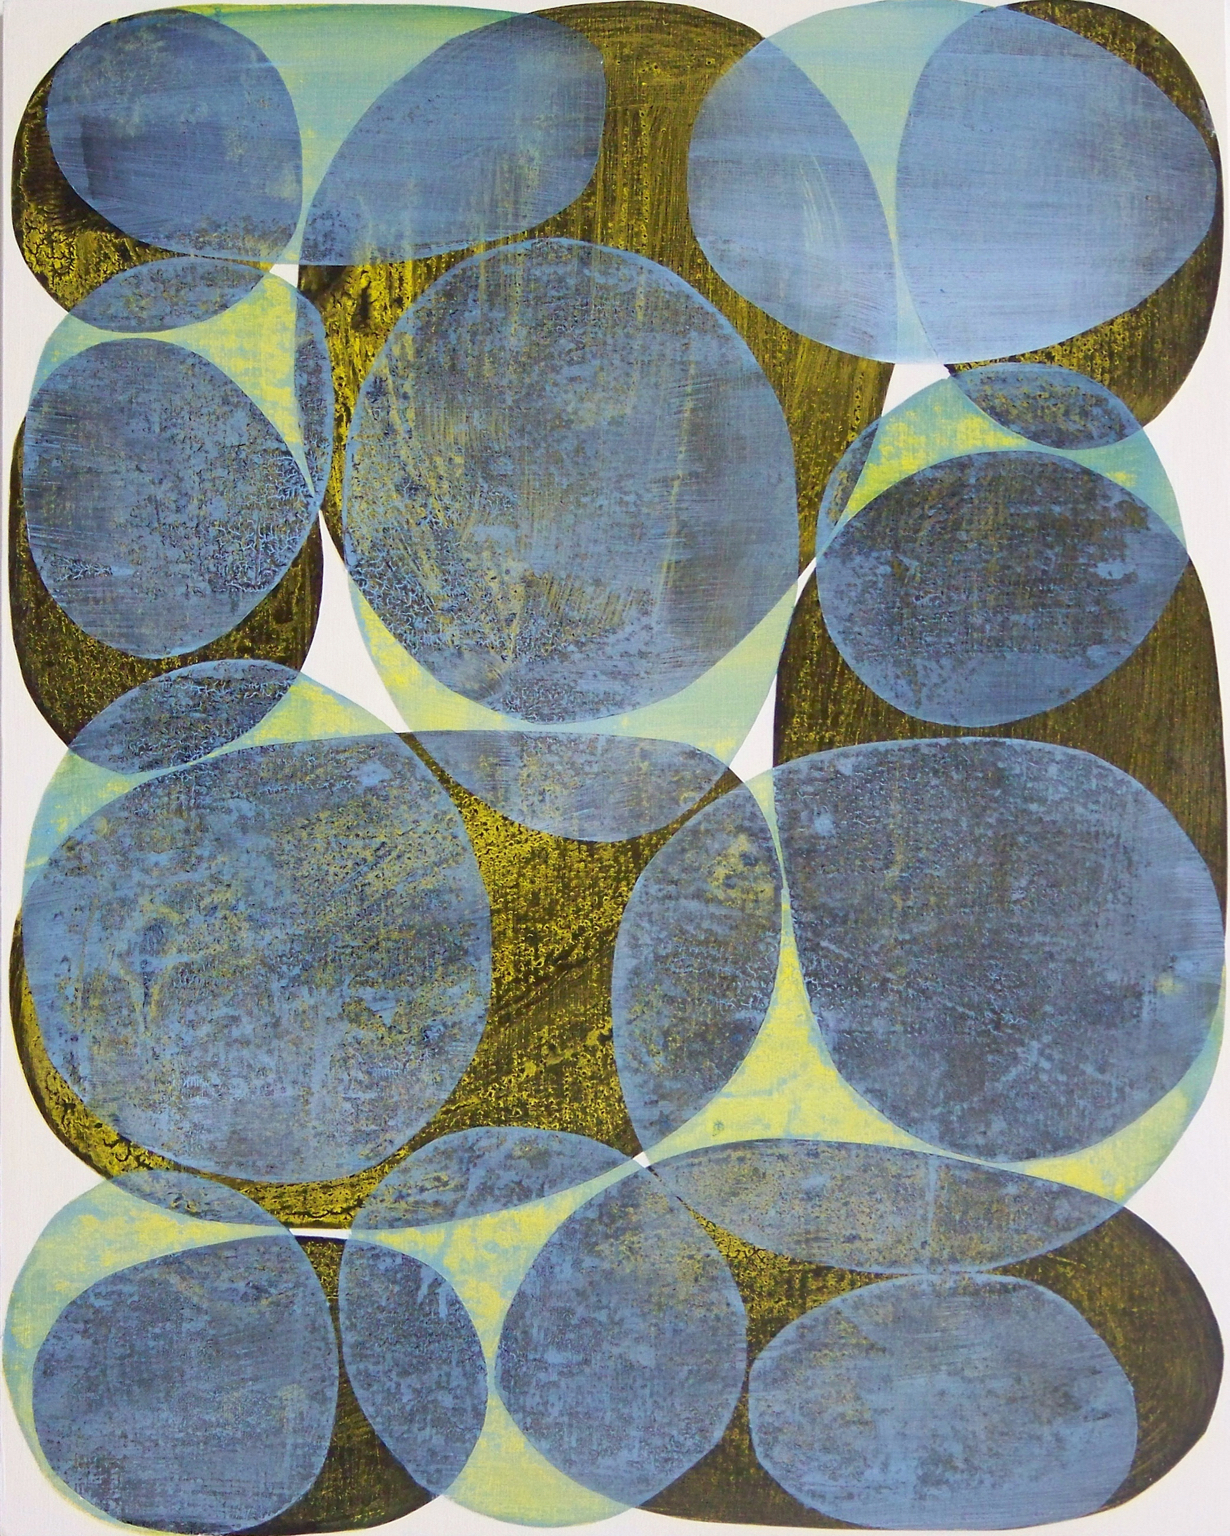 D. Driscoll,  Inner Garden 23 , acrylic on panel, 20x16